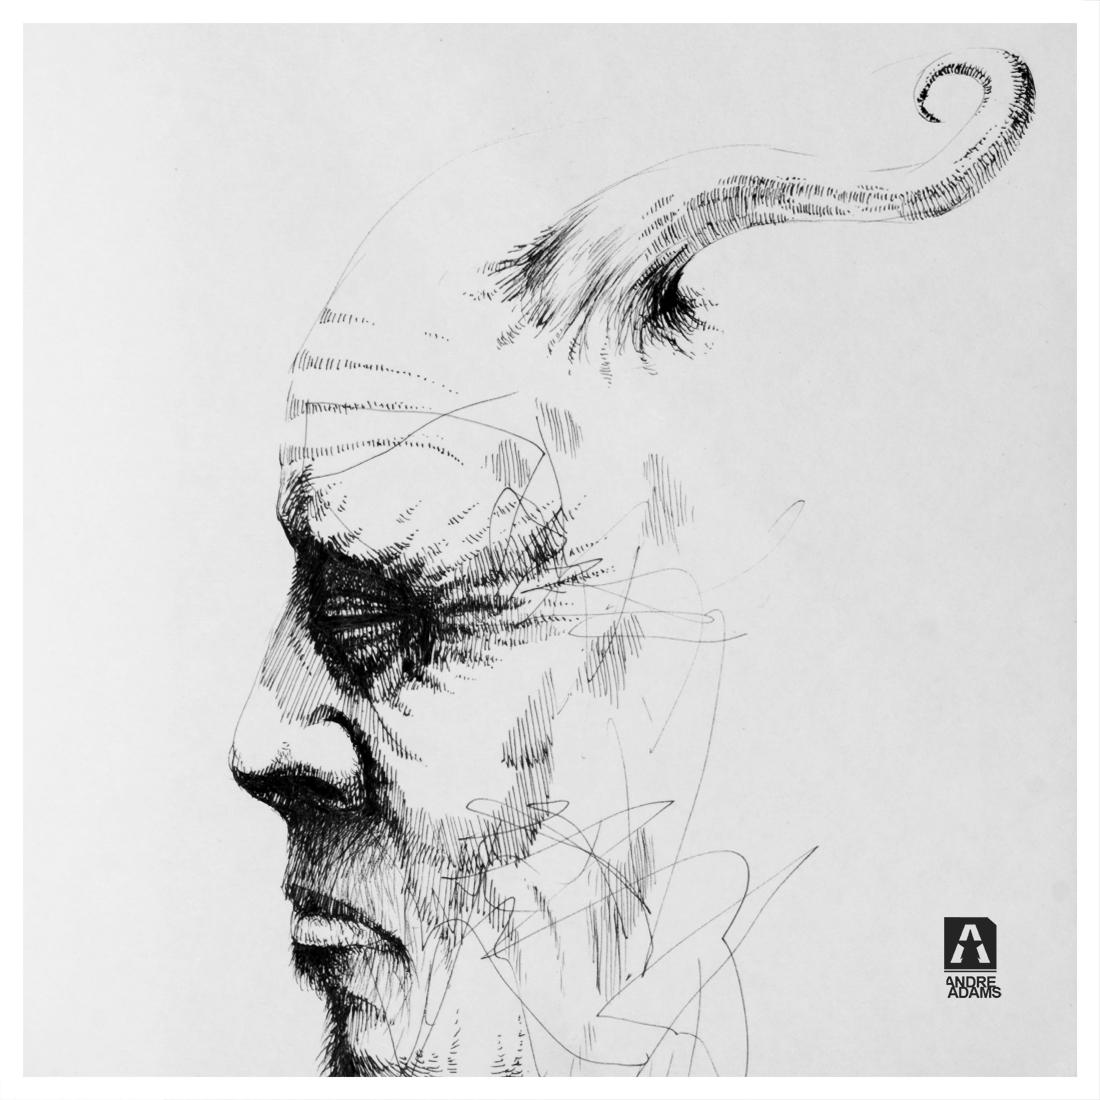 The Man who grew a horn